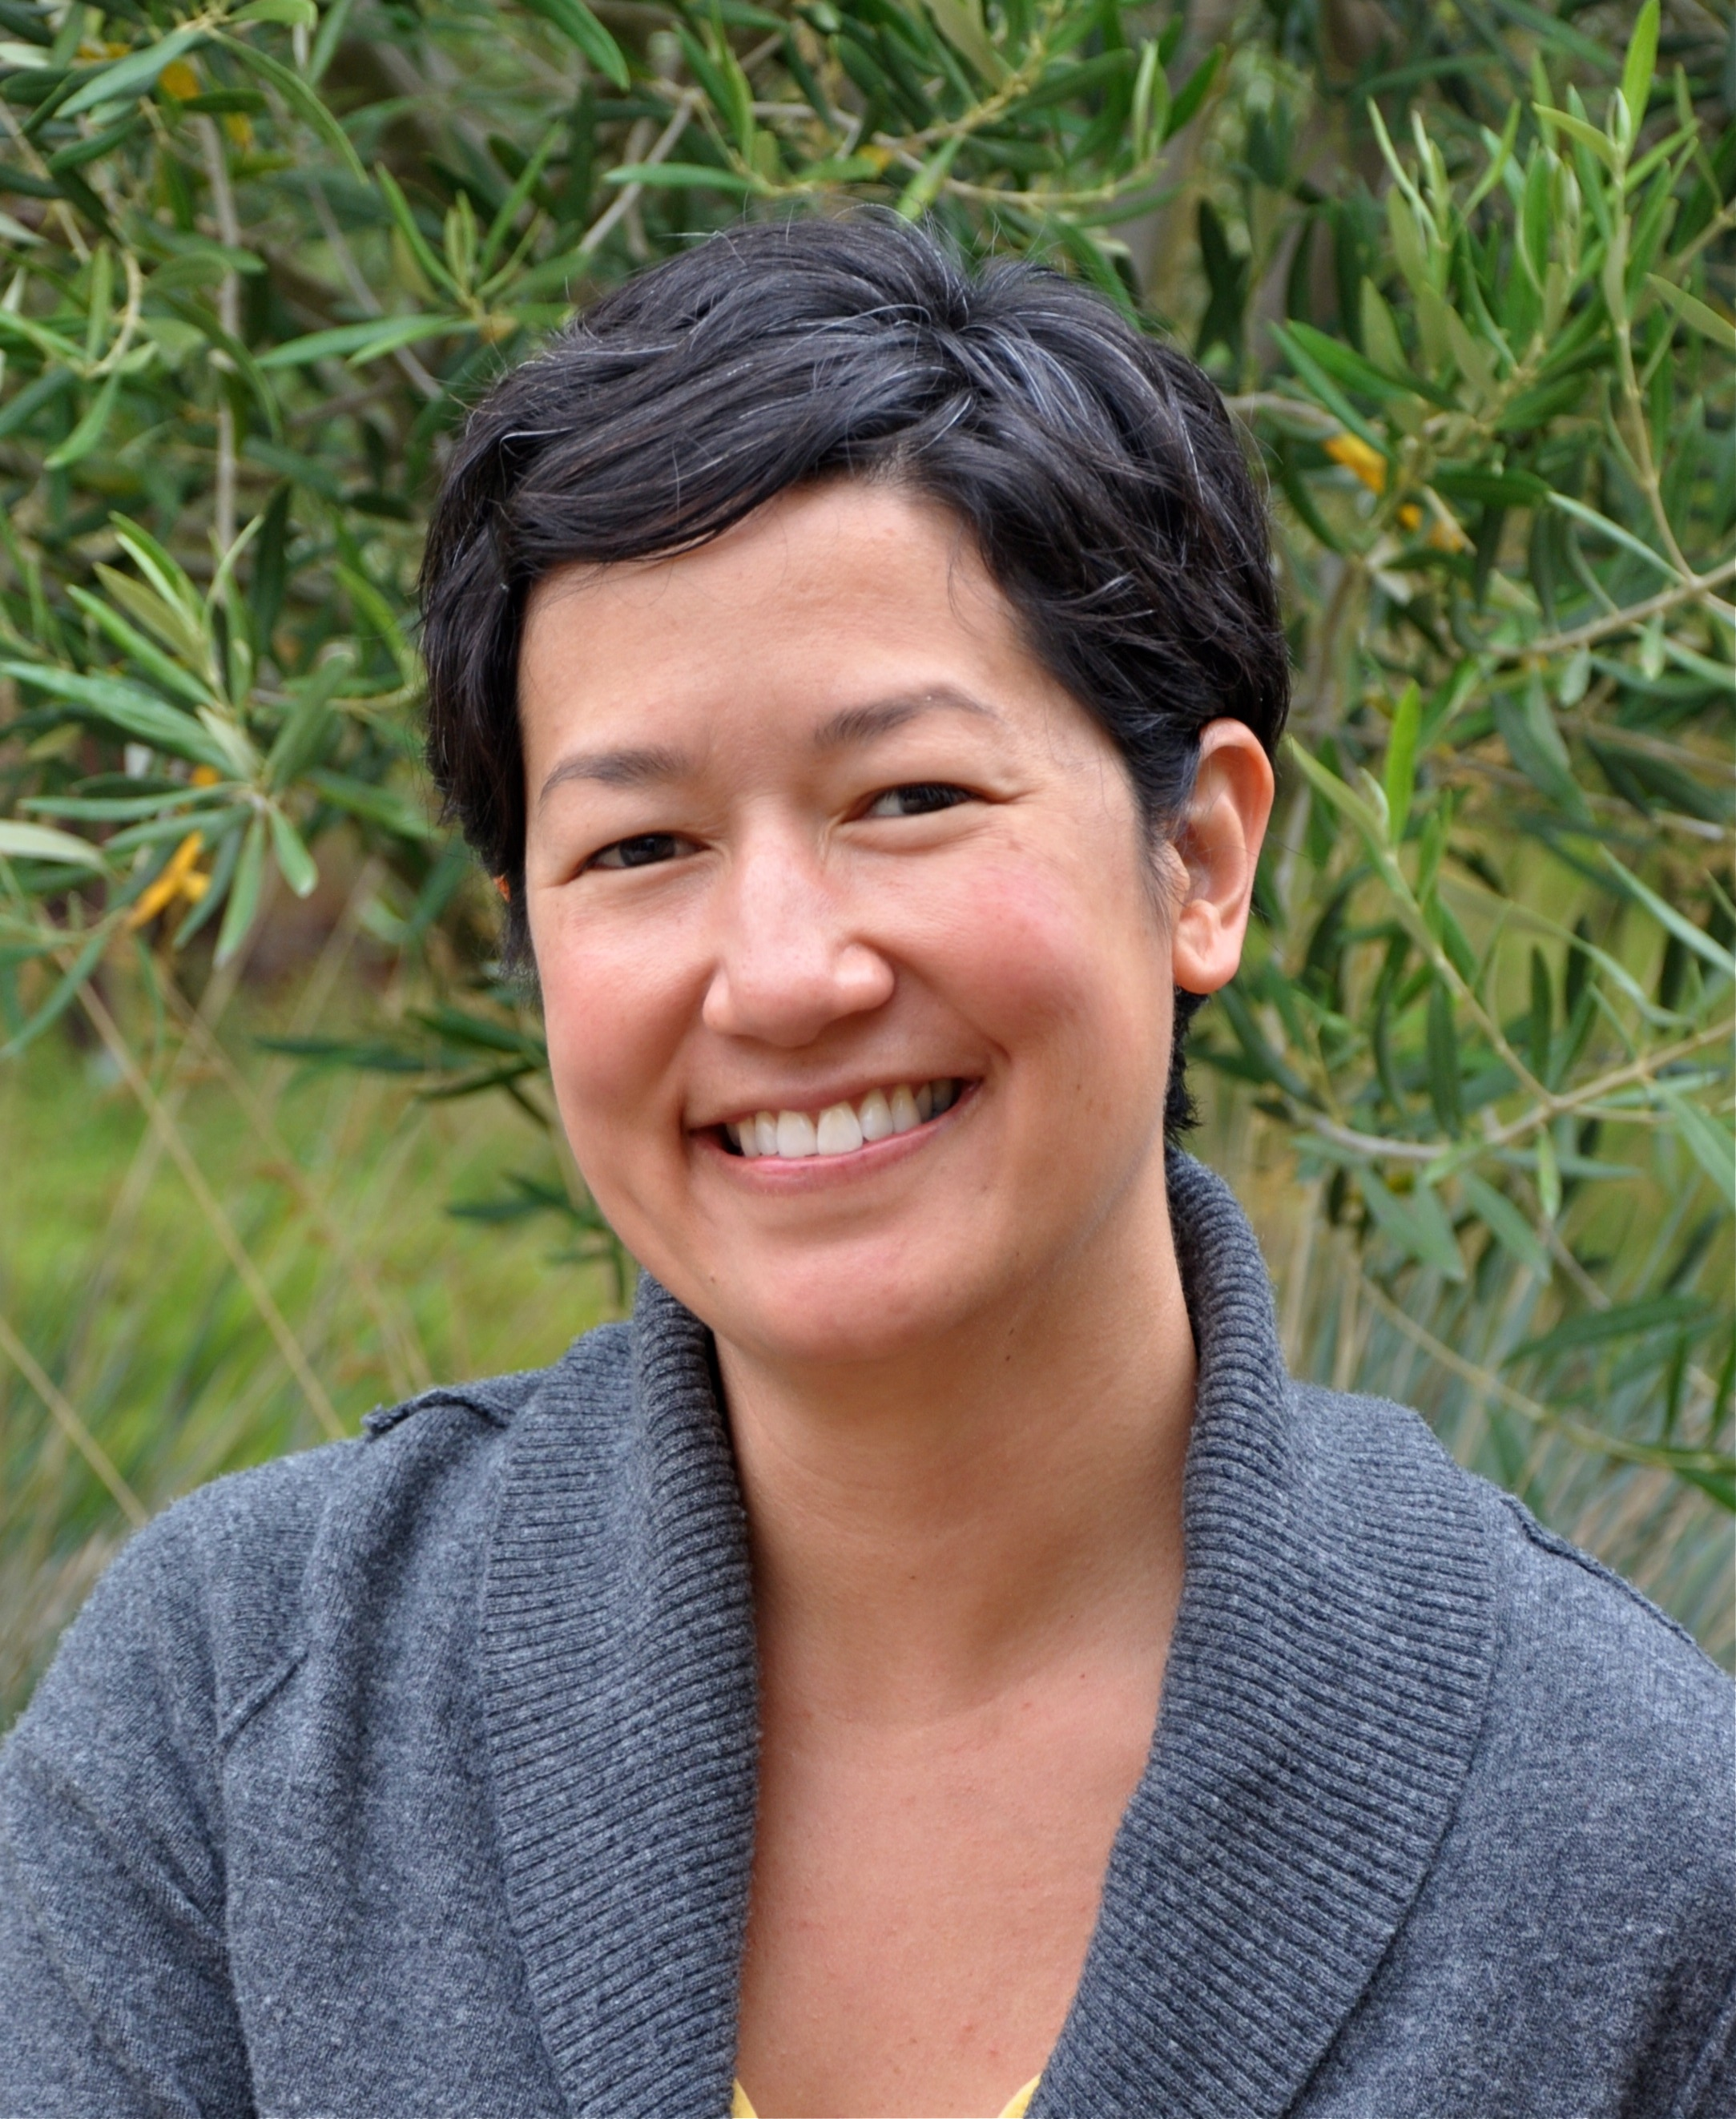 Miya Yoshitani, Associate Director of Asian Pacific Environmental Network (APEN)